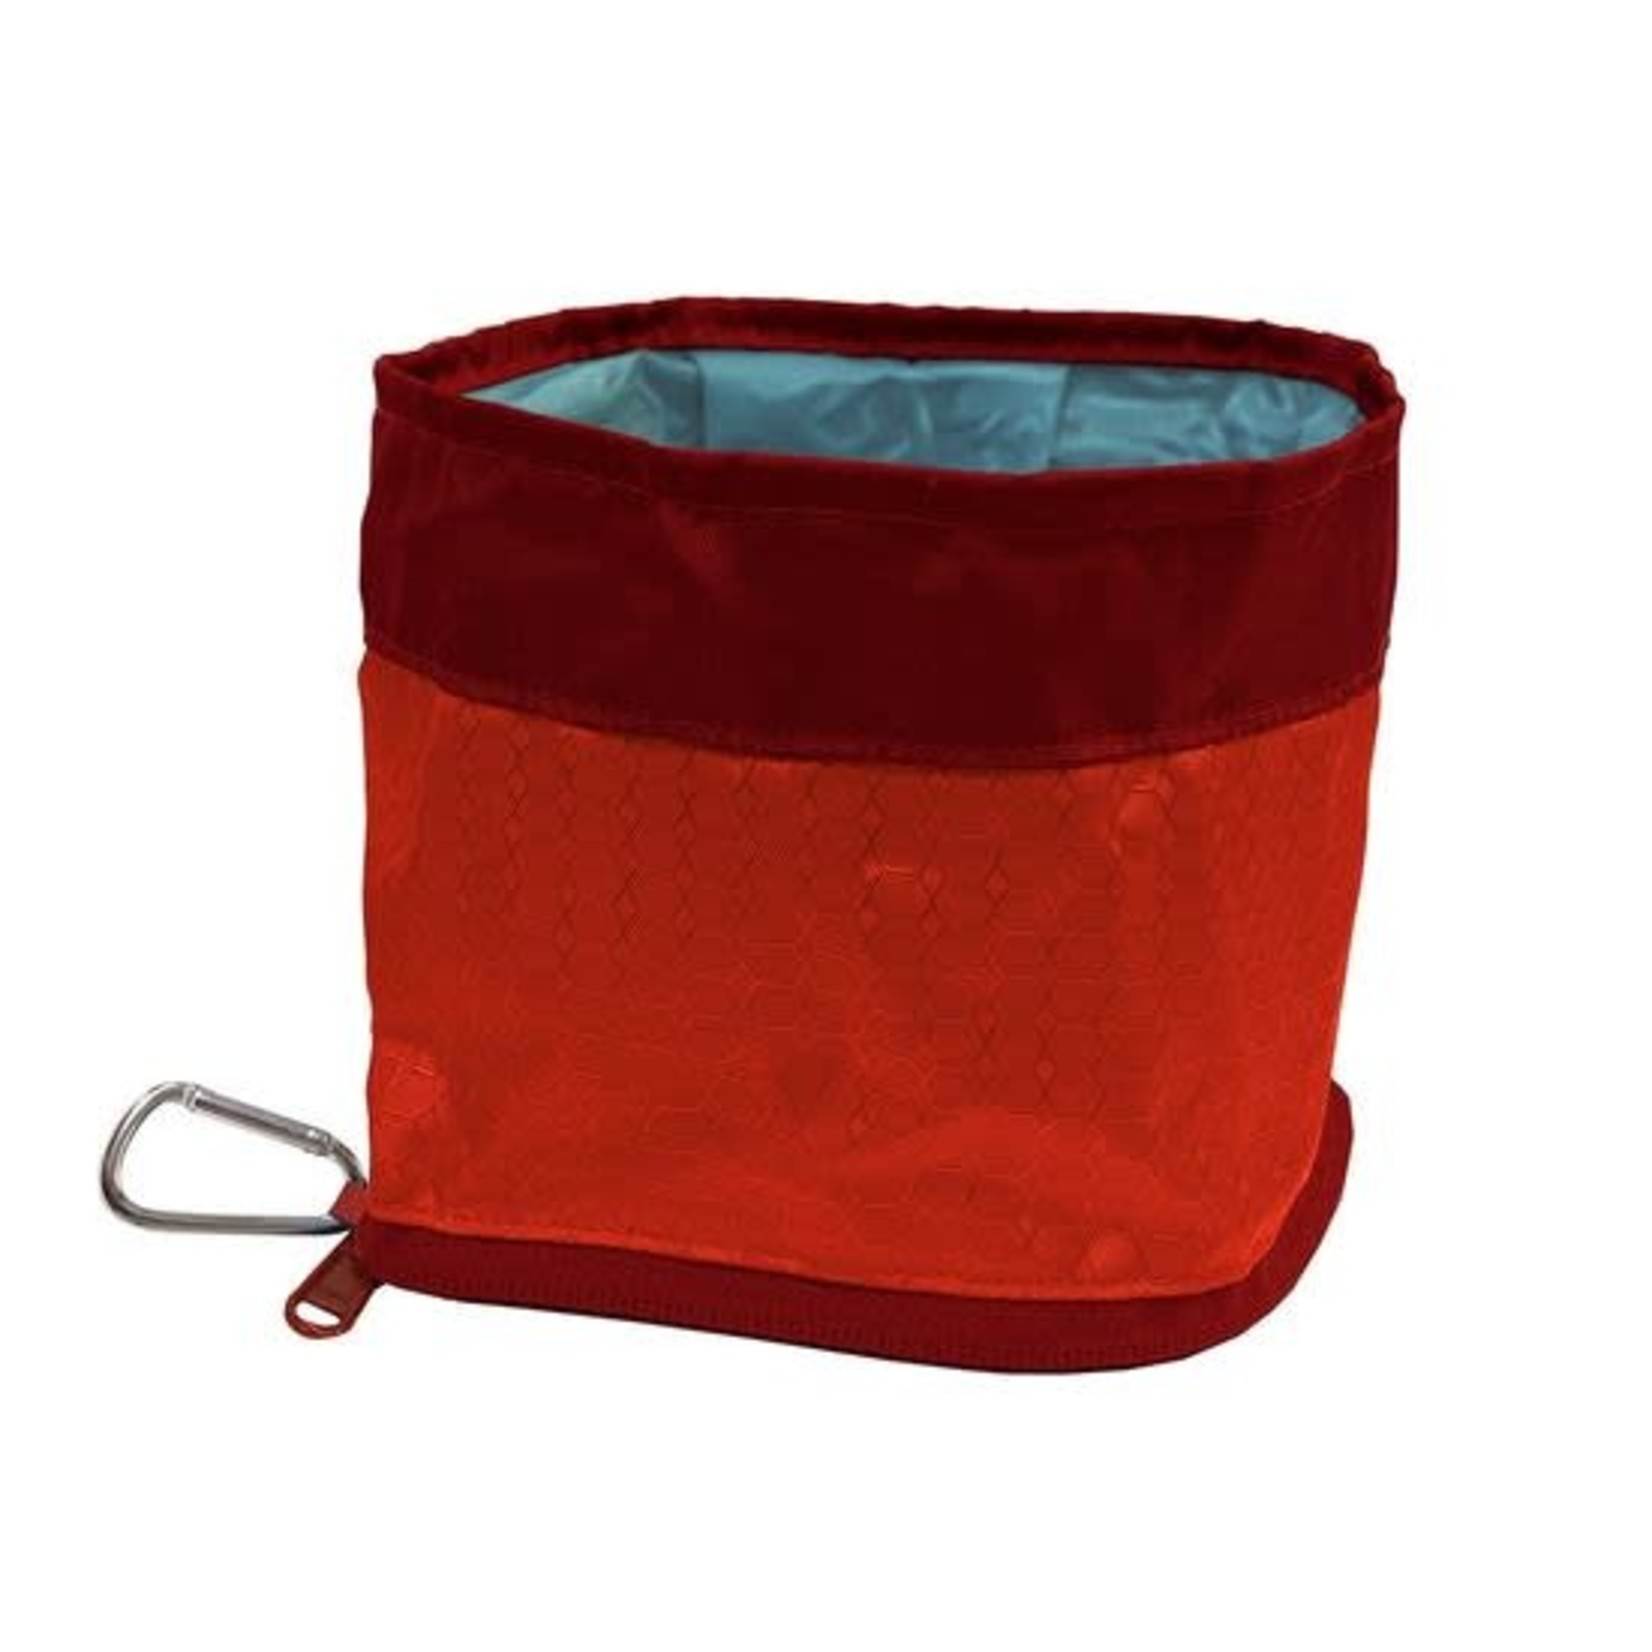 Kurgo Kurgo Zippy Bowl Barn Red